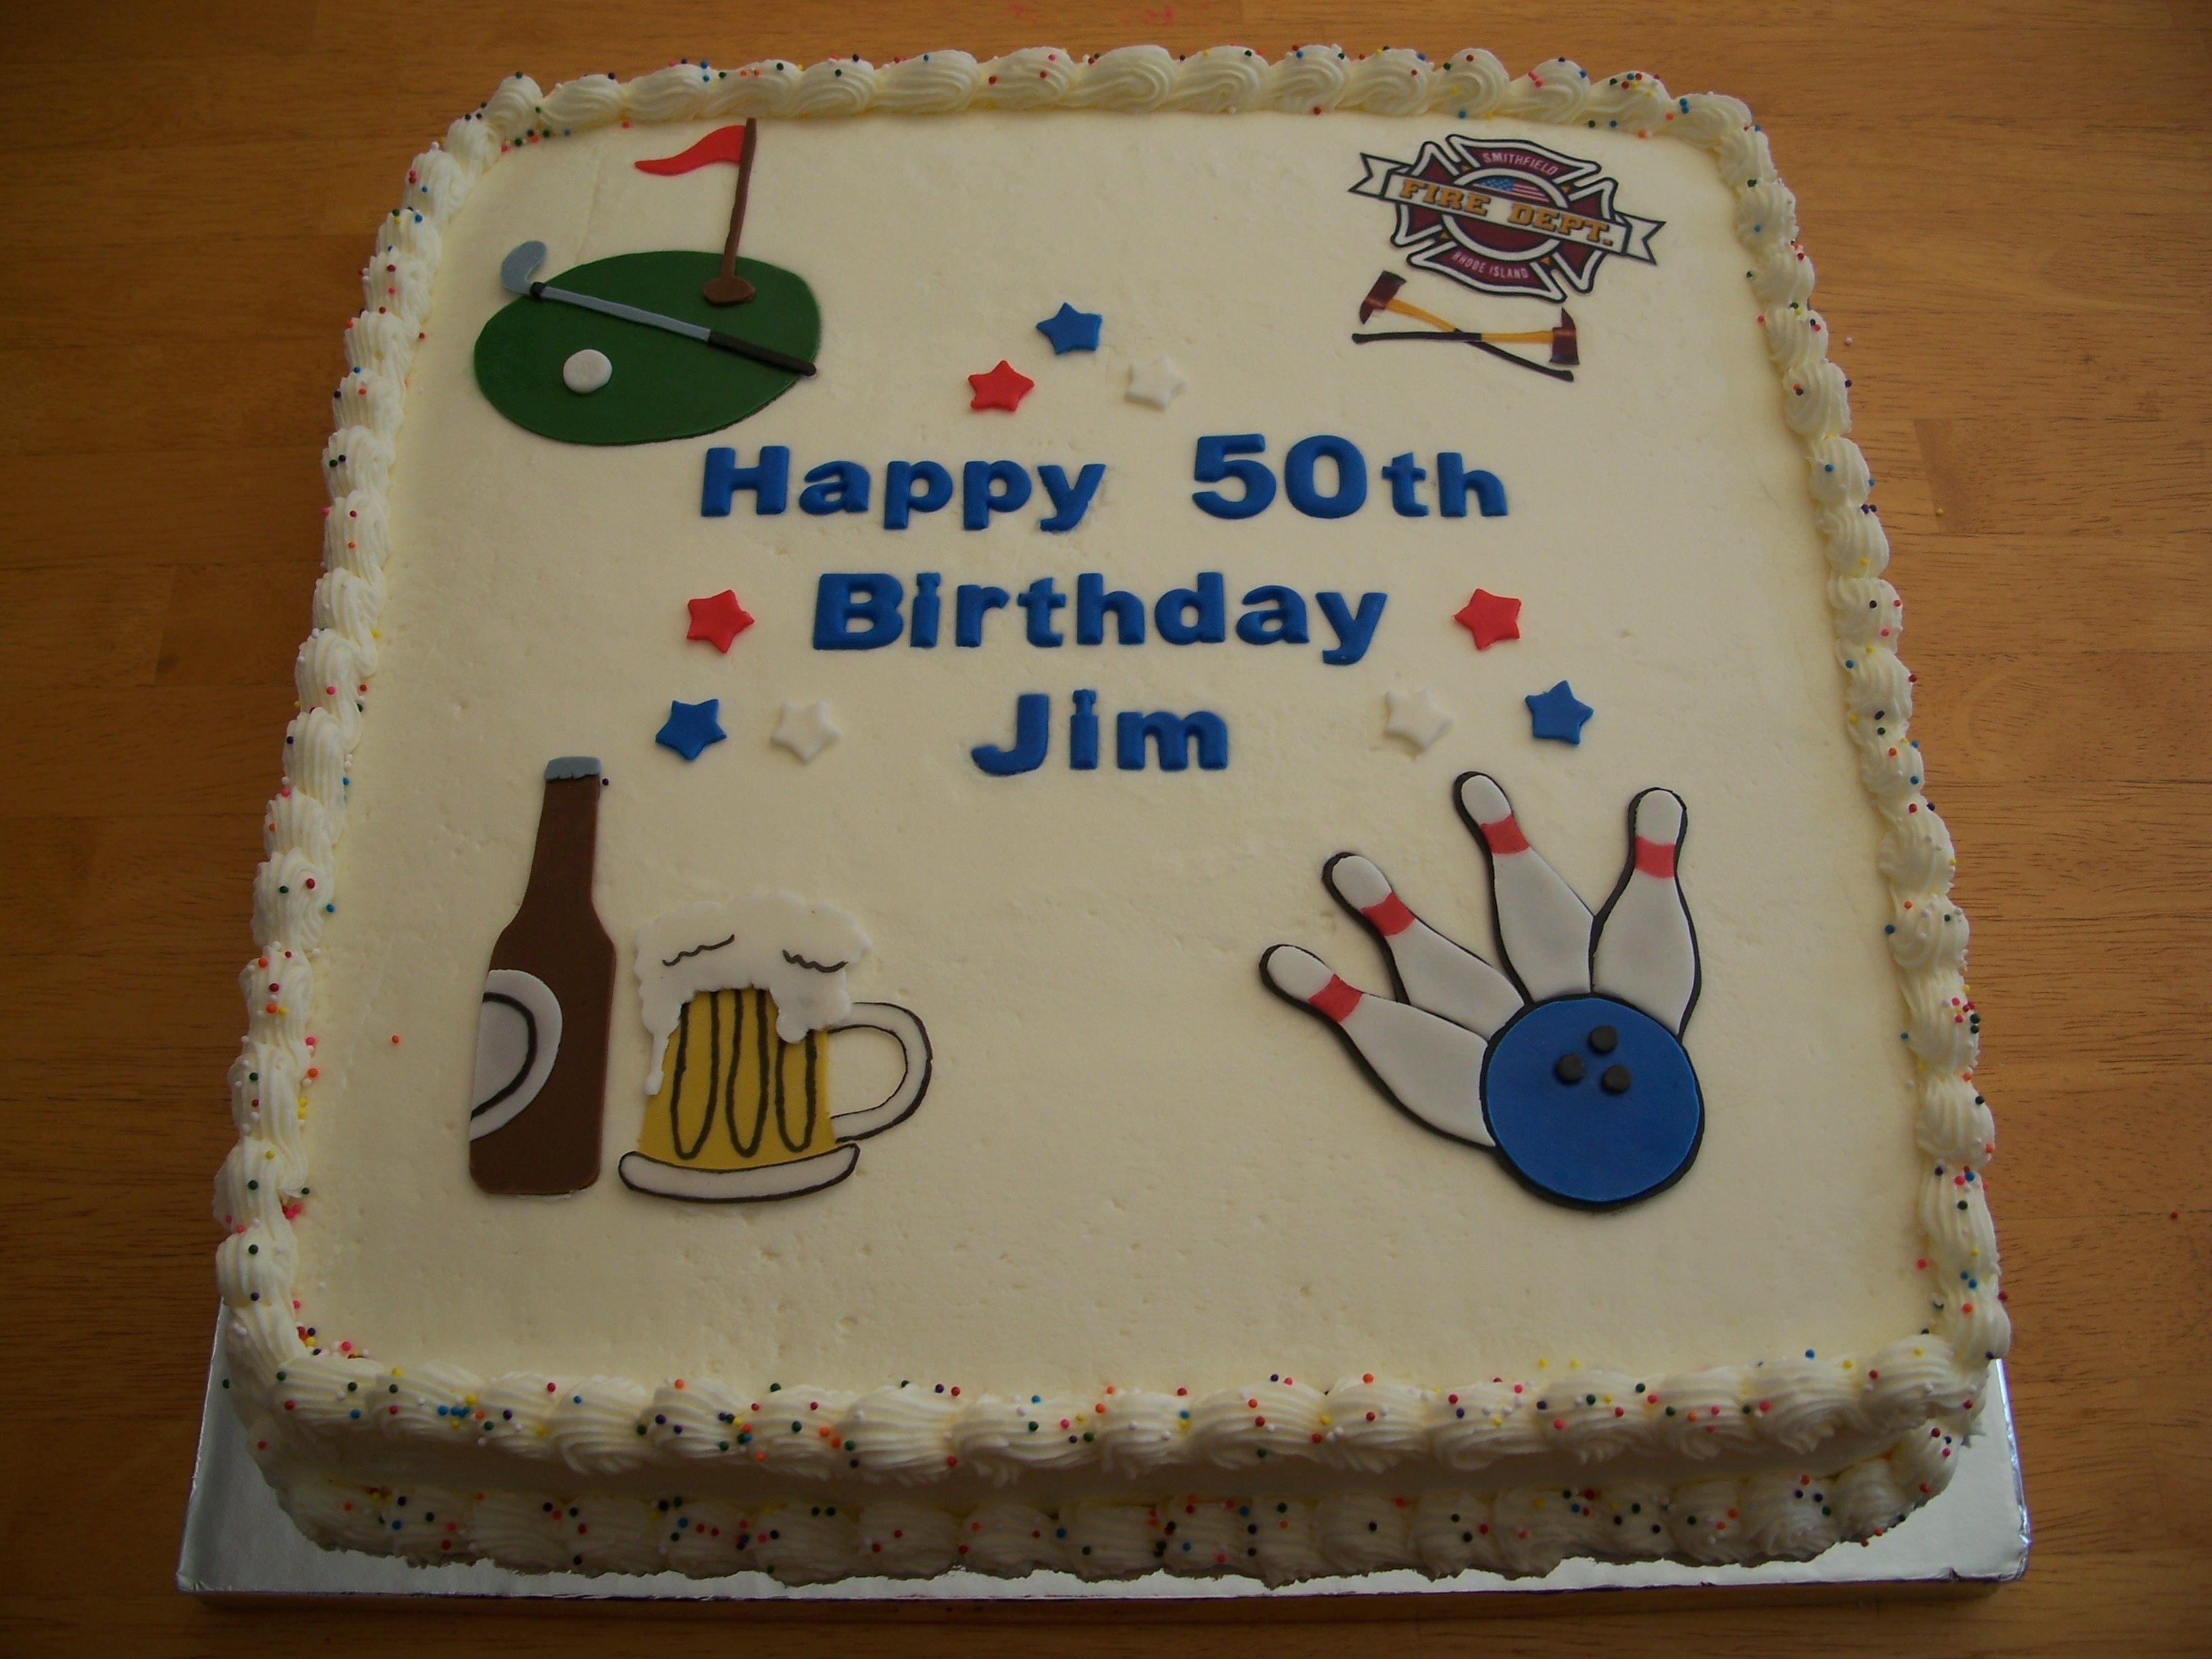 Cake Ideas For 50th Birthday Funny : 50th Birthday Cake Fun Stuff Pinterest